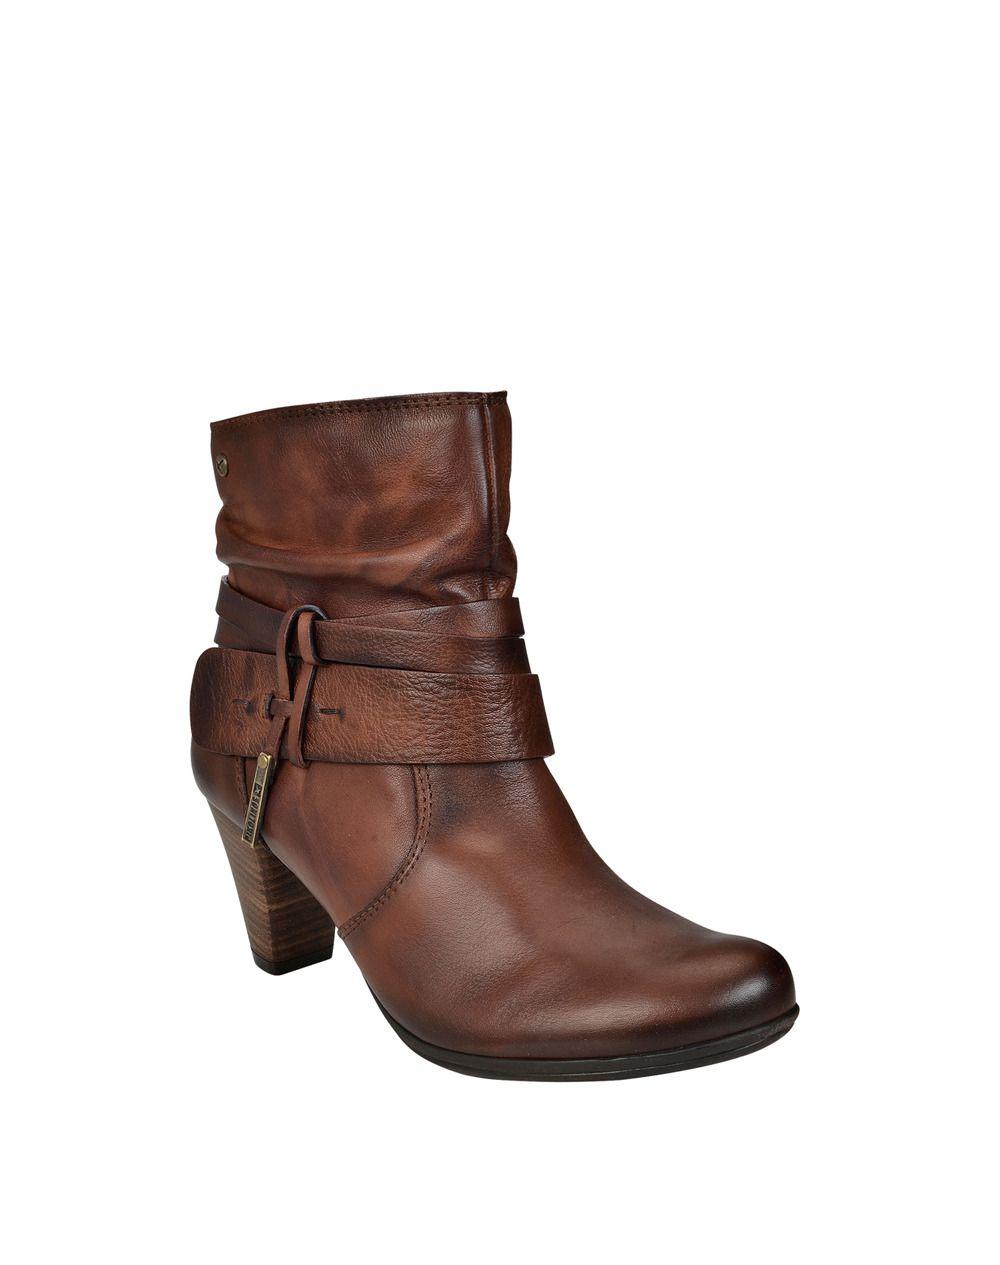 baratas para descuento mirada detallada venta caliente Pin en Zapatos,Botas...<3